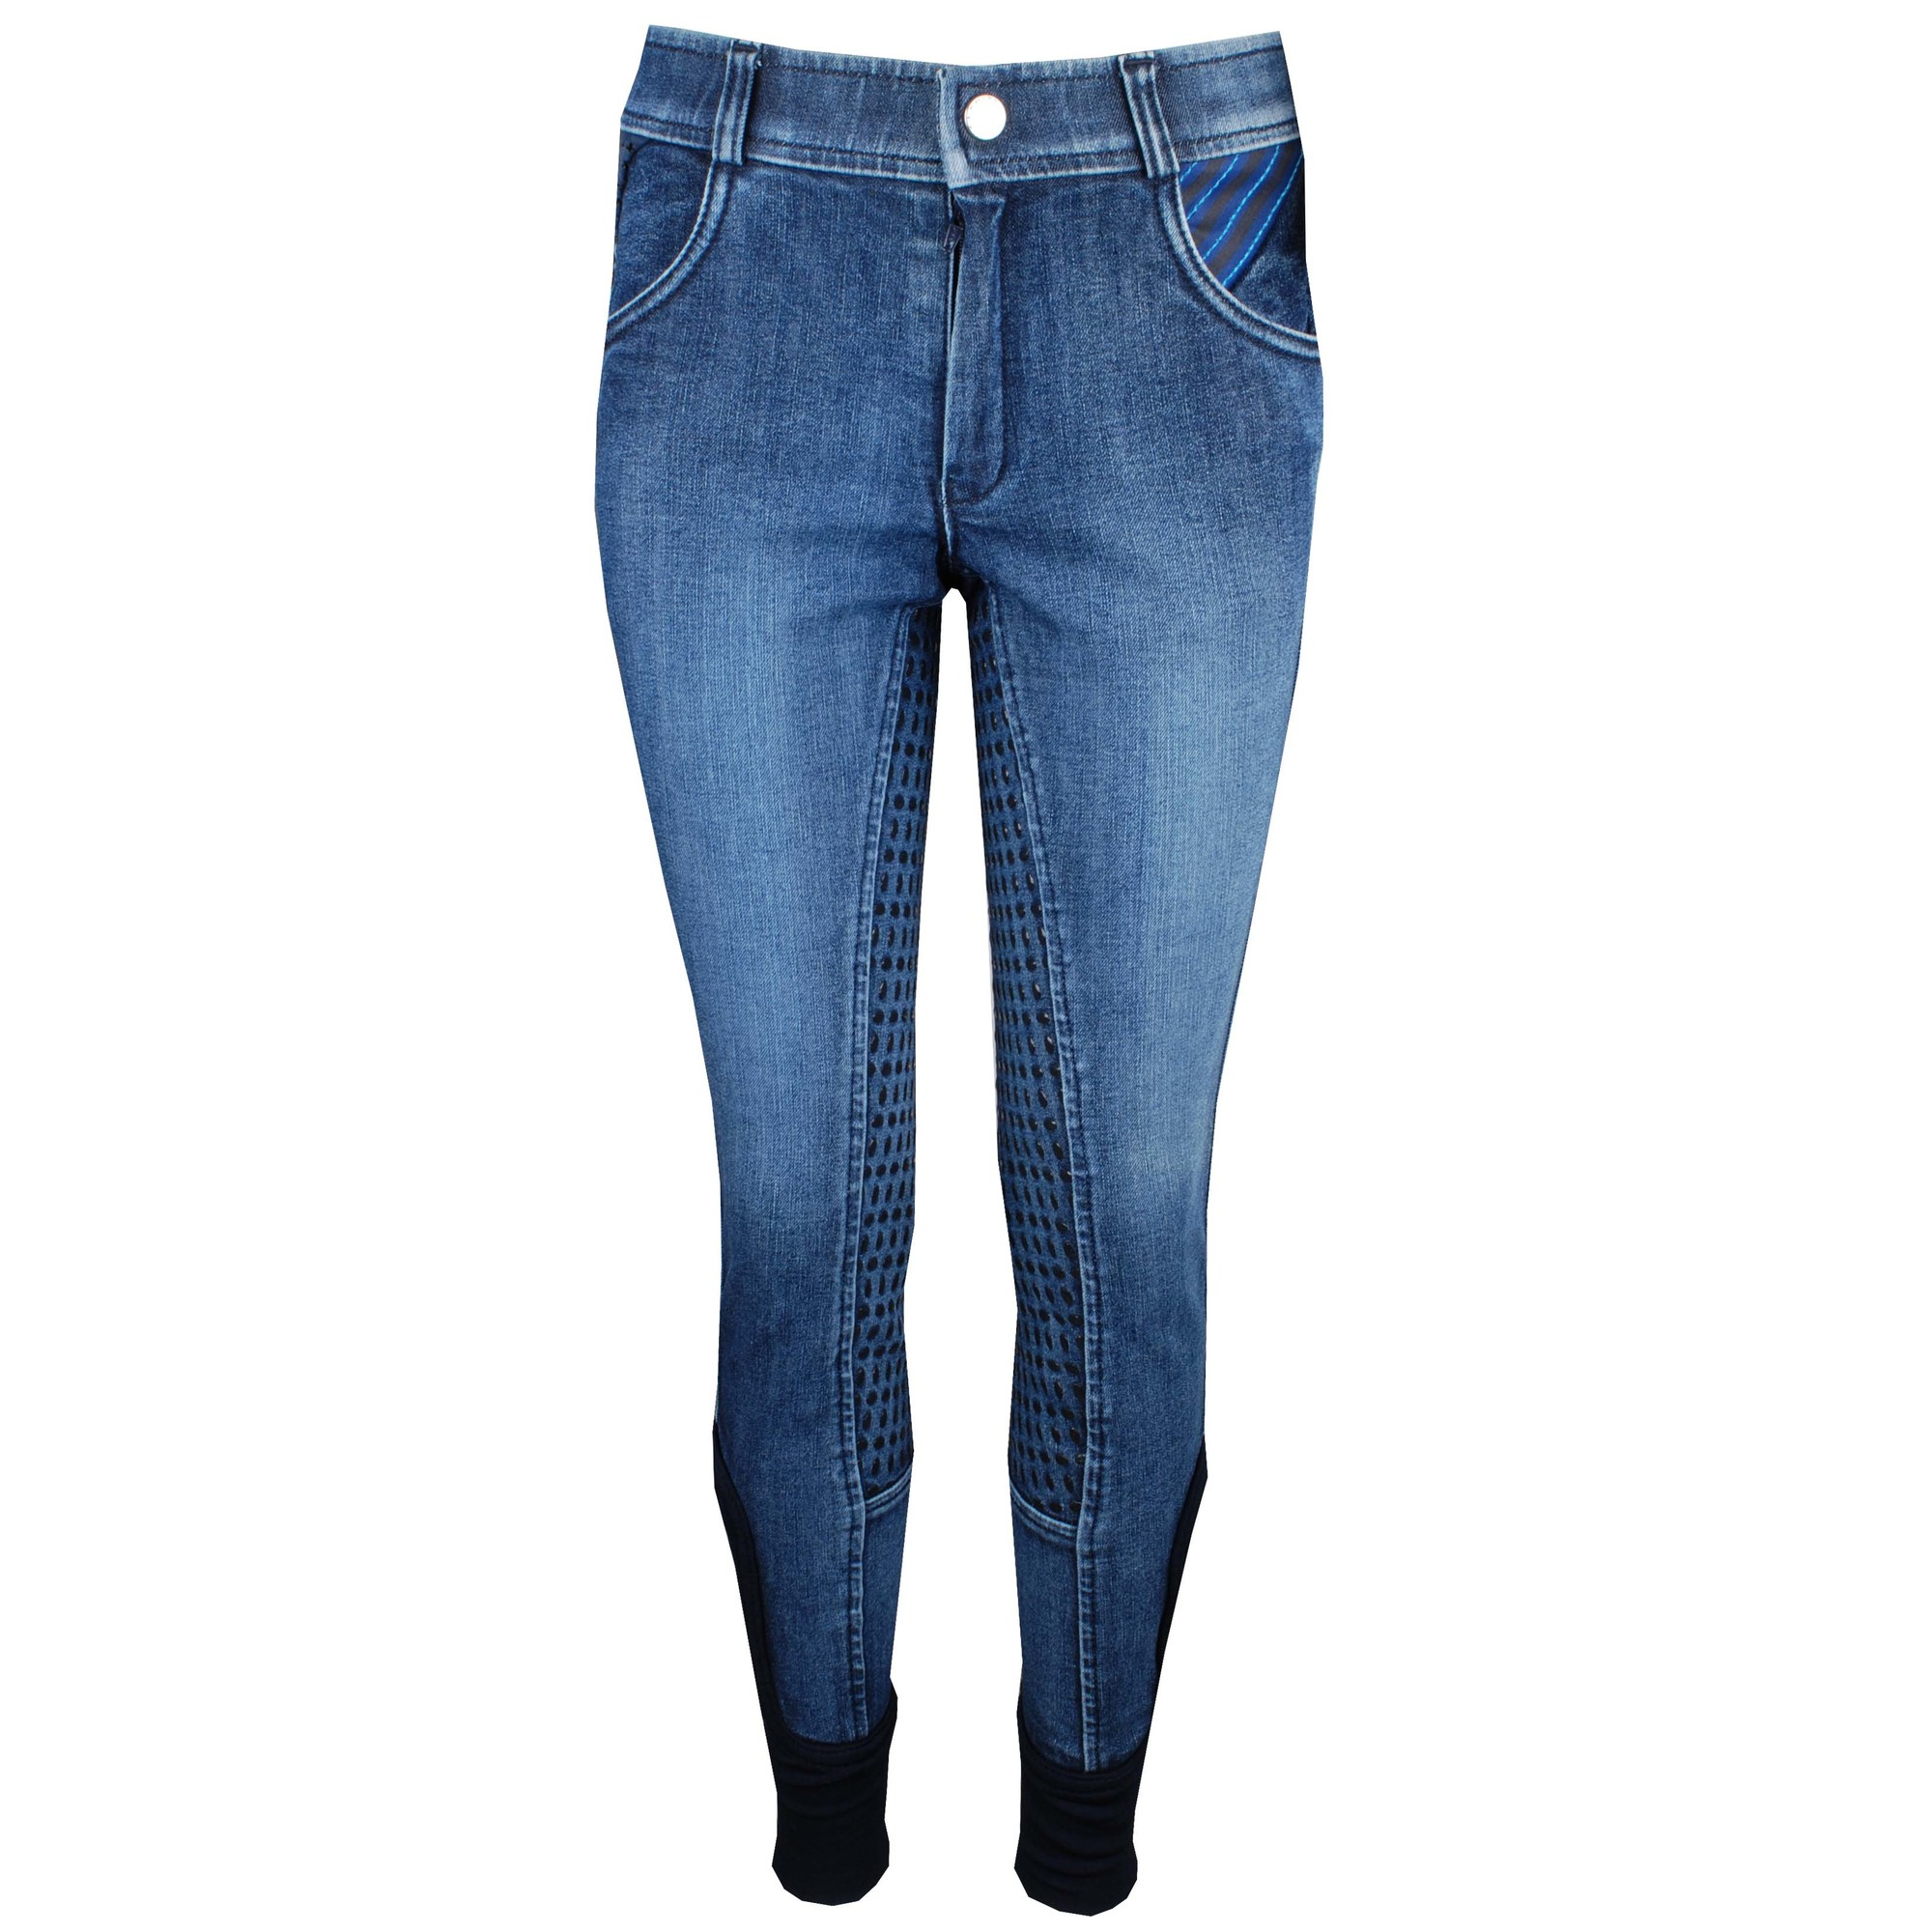 Harrys Horse Loulou Bowhill kinder rijbroek jeans maat:152